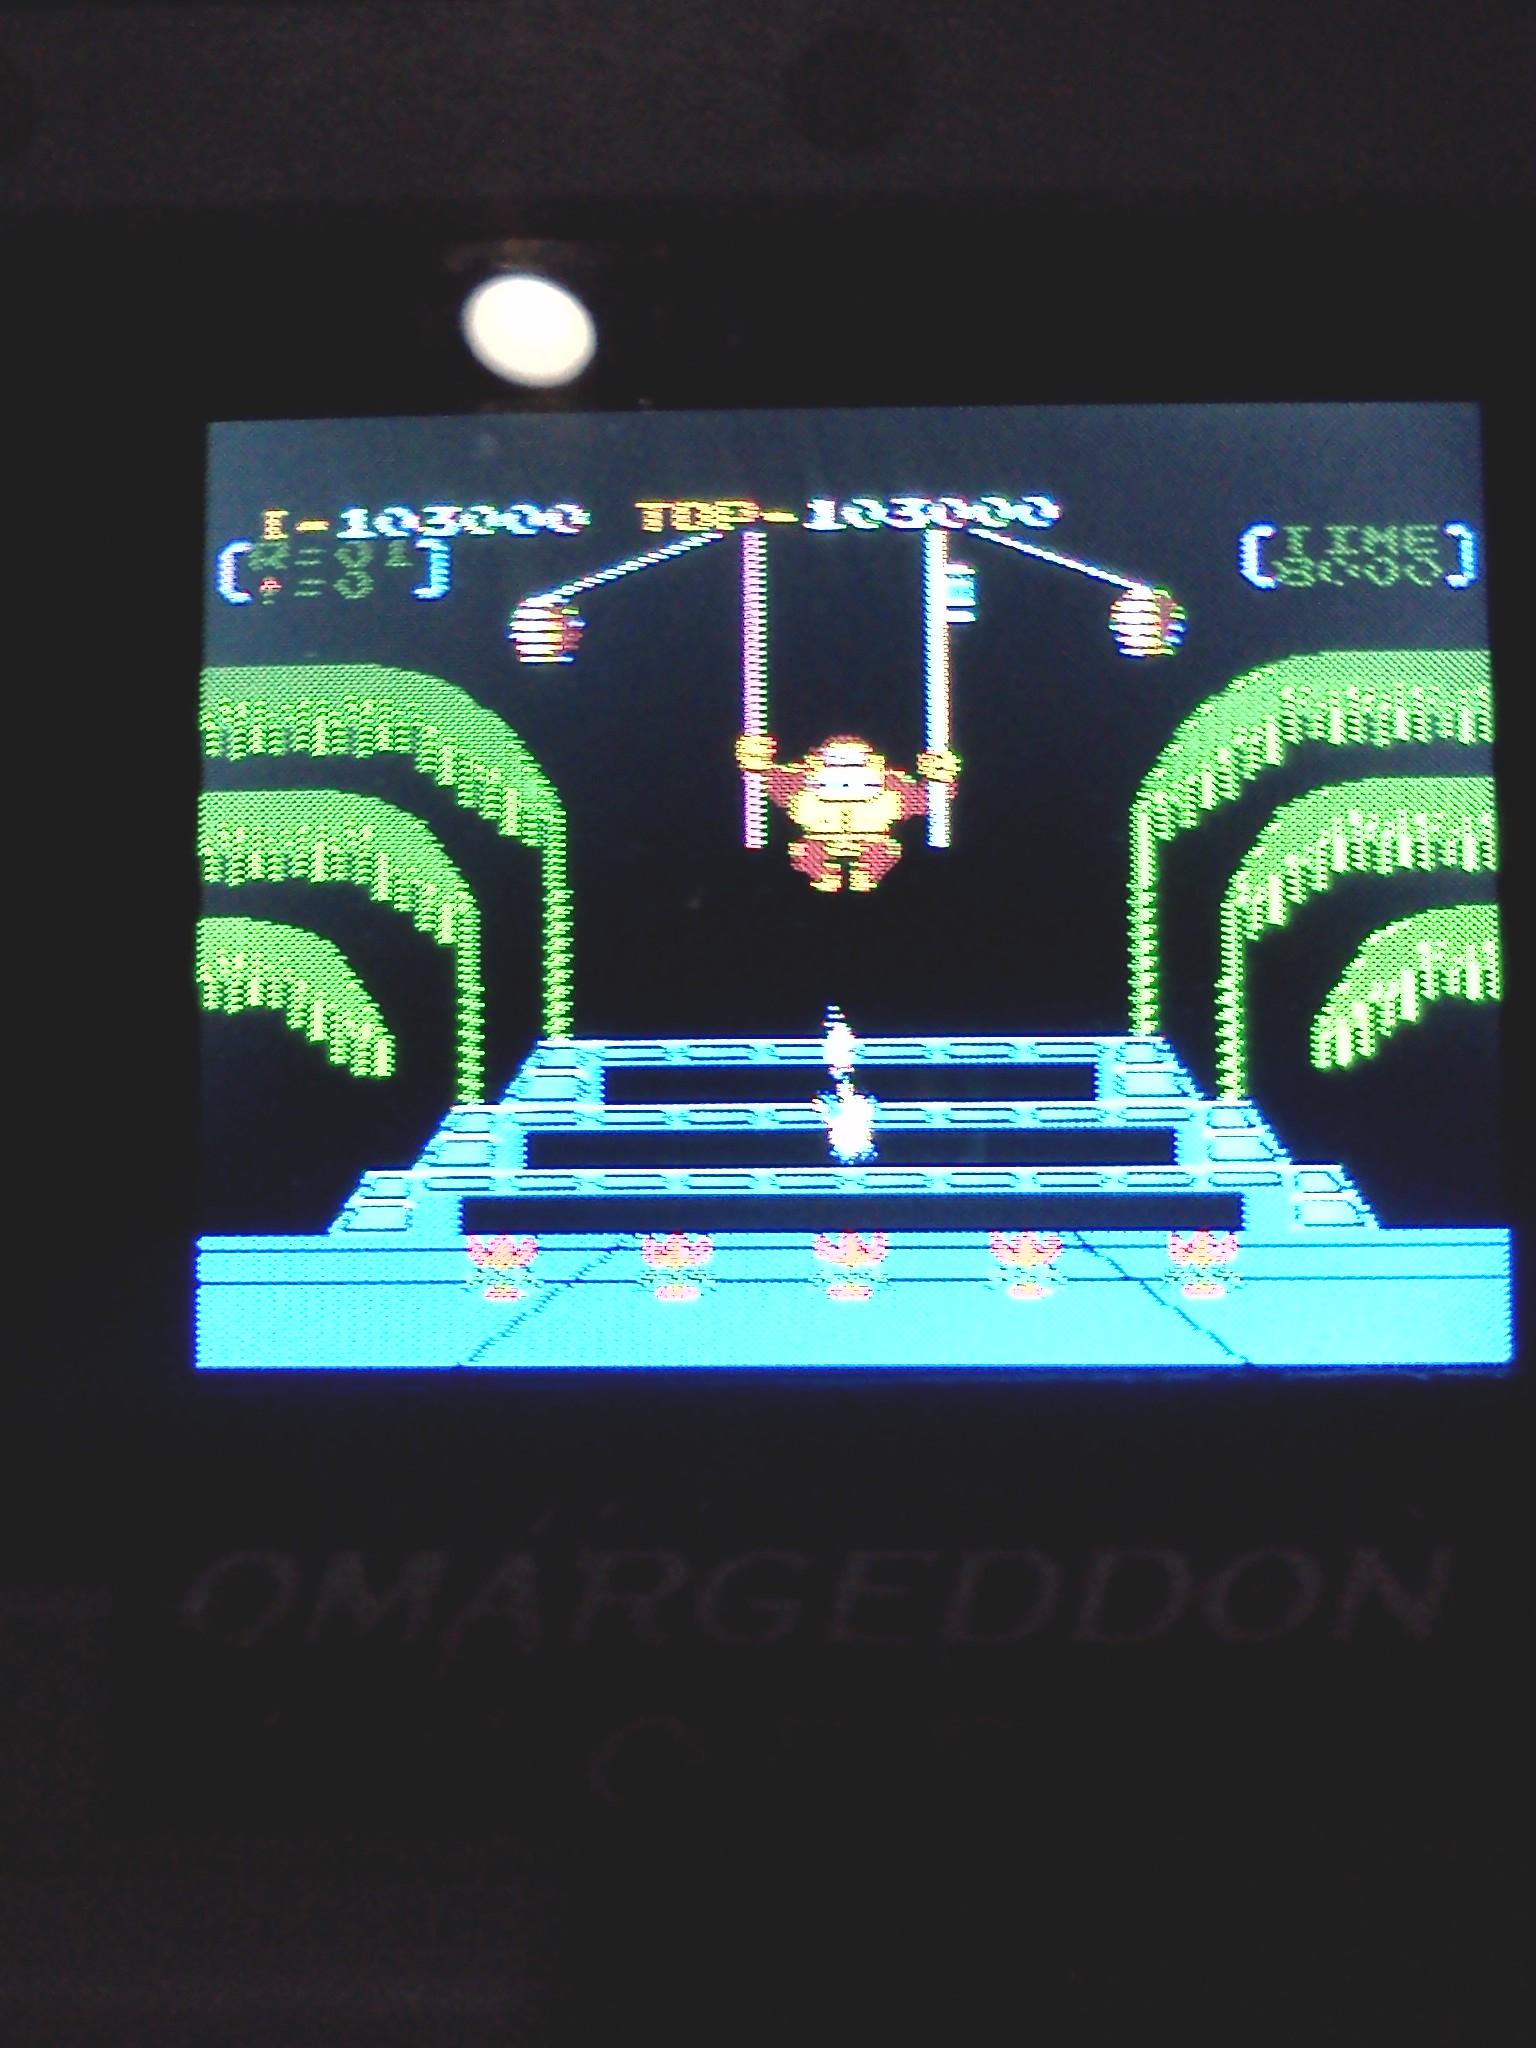 omargeddon: Donkey Kong 3: Game A (NES/Famicom Emulated) 103,000 points on 2016-08-07 18:03:28